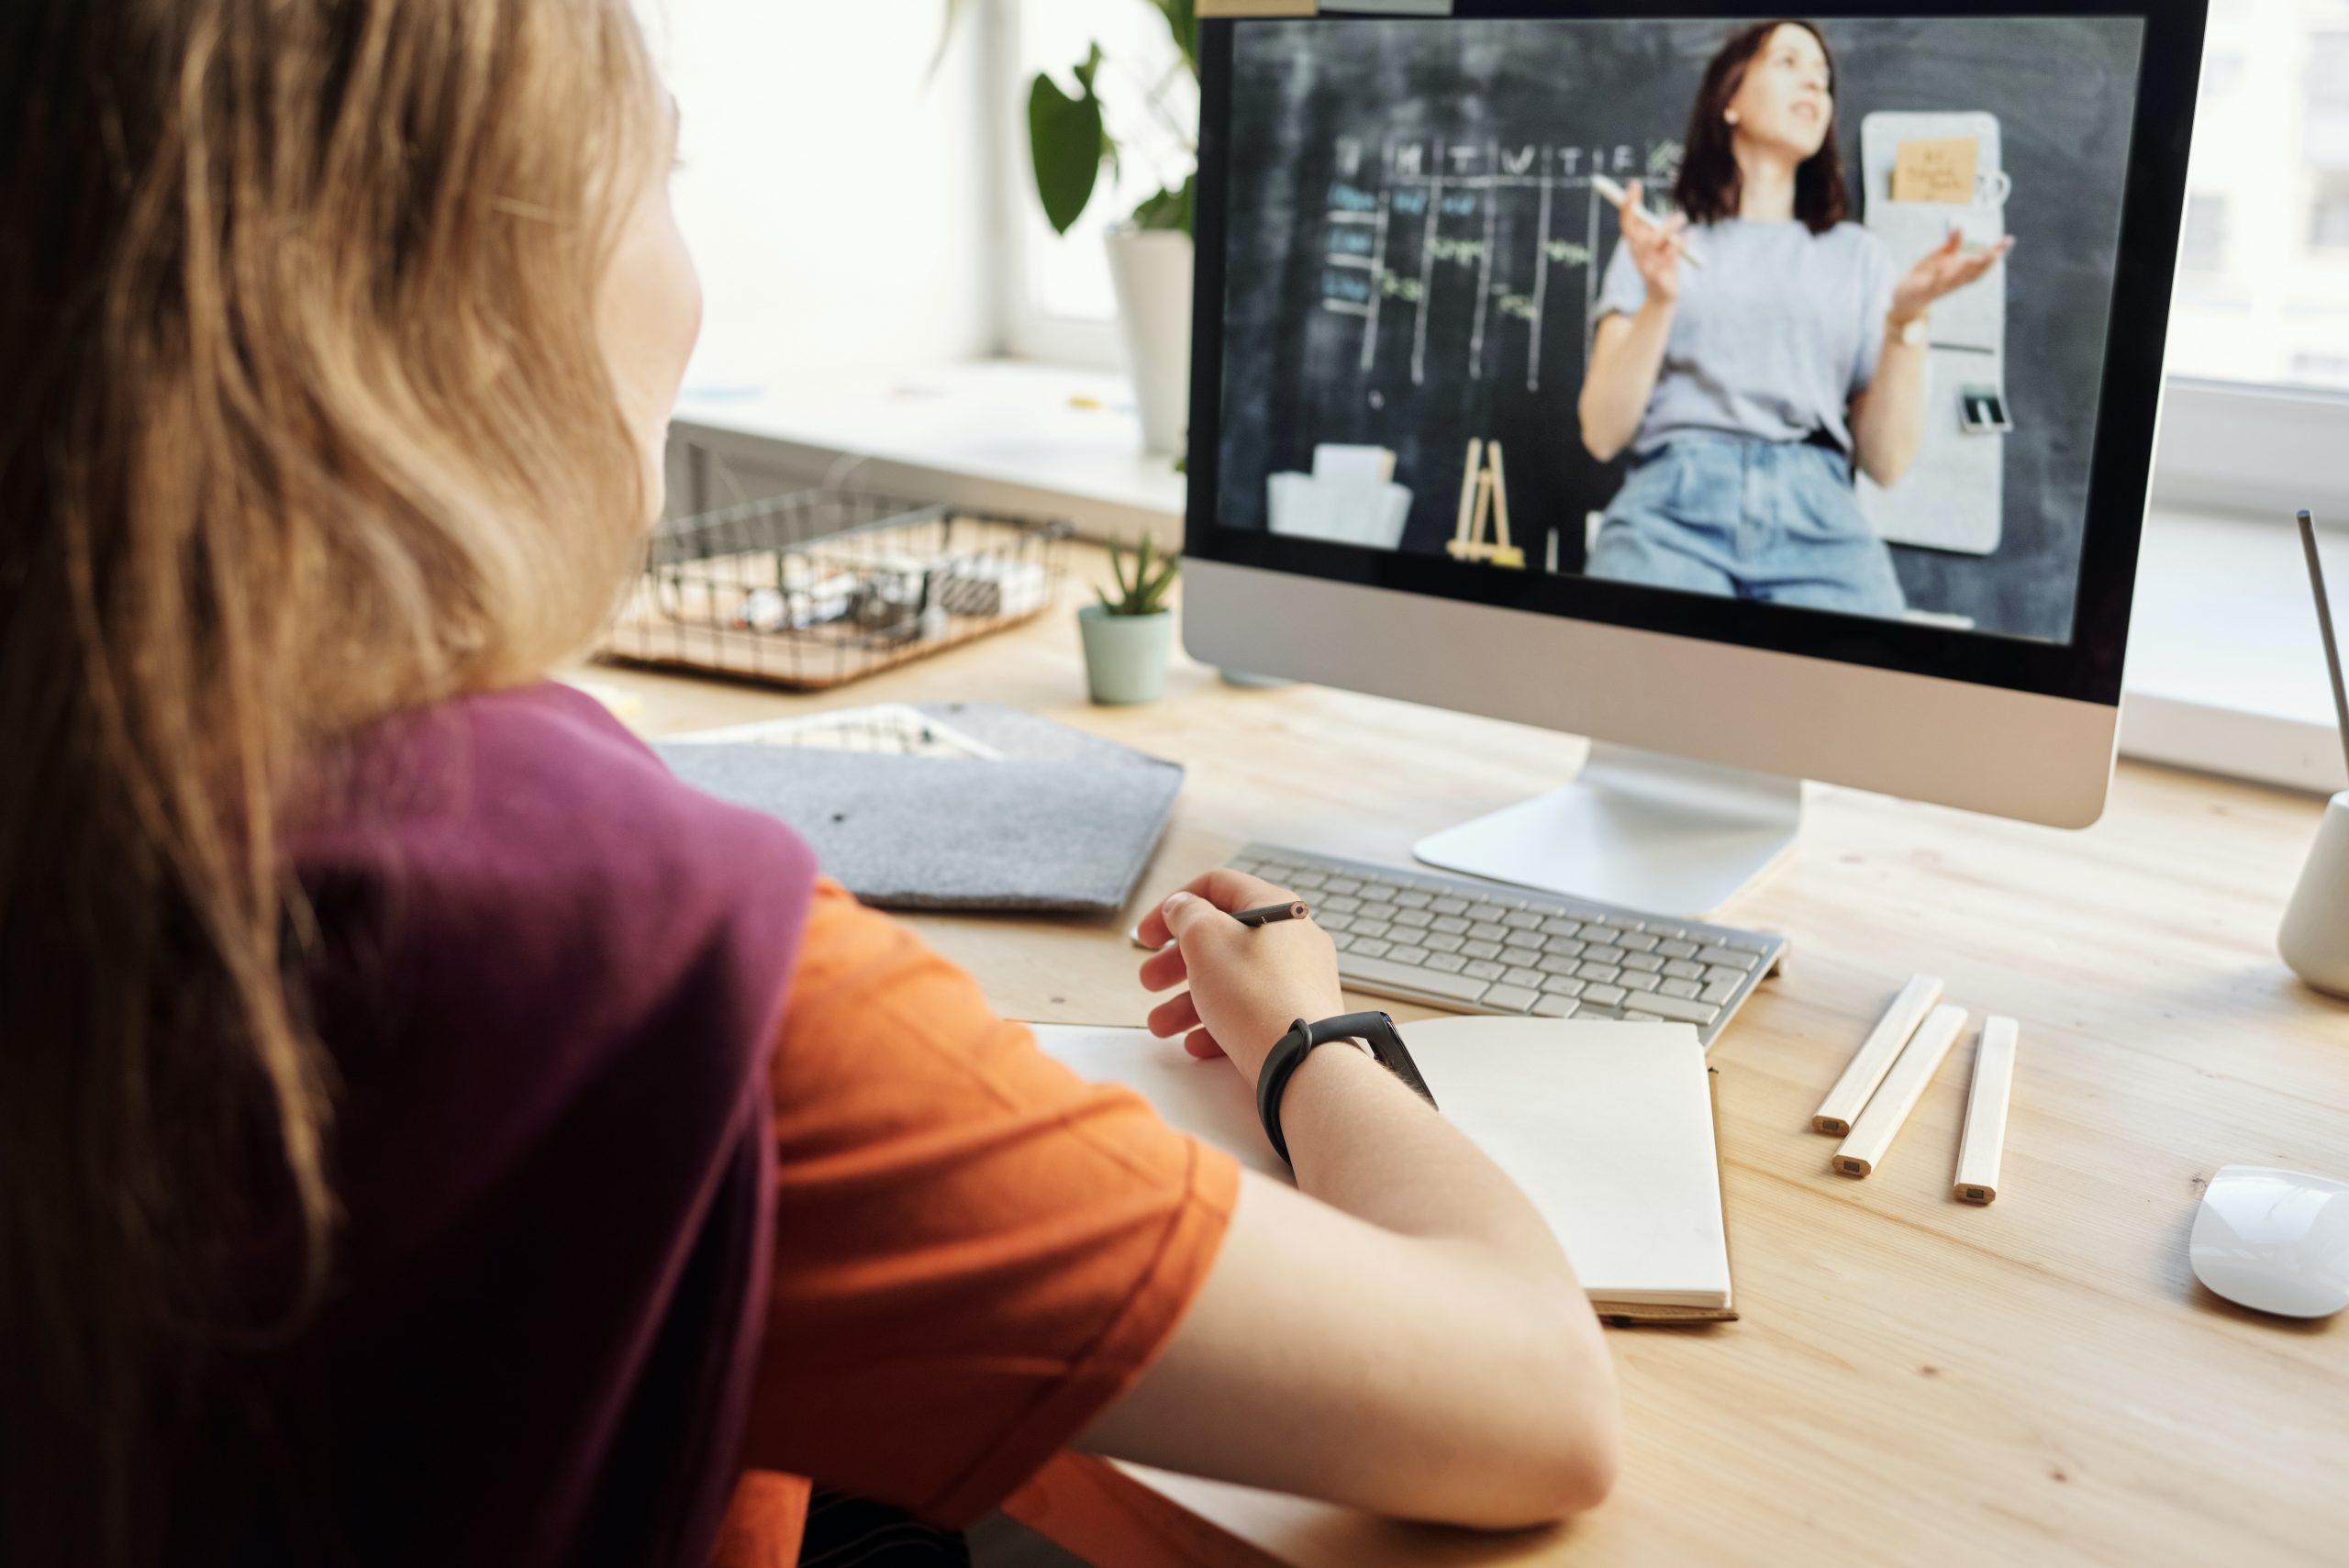 Girl virtual learning via internet